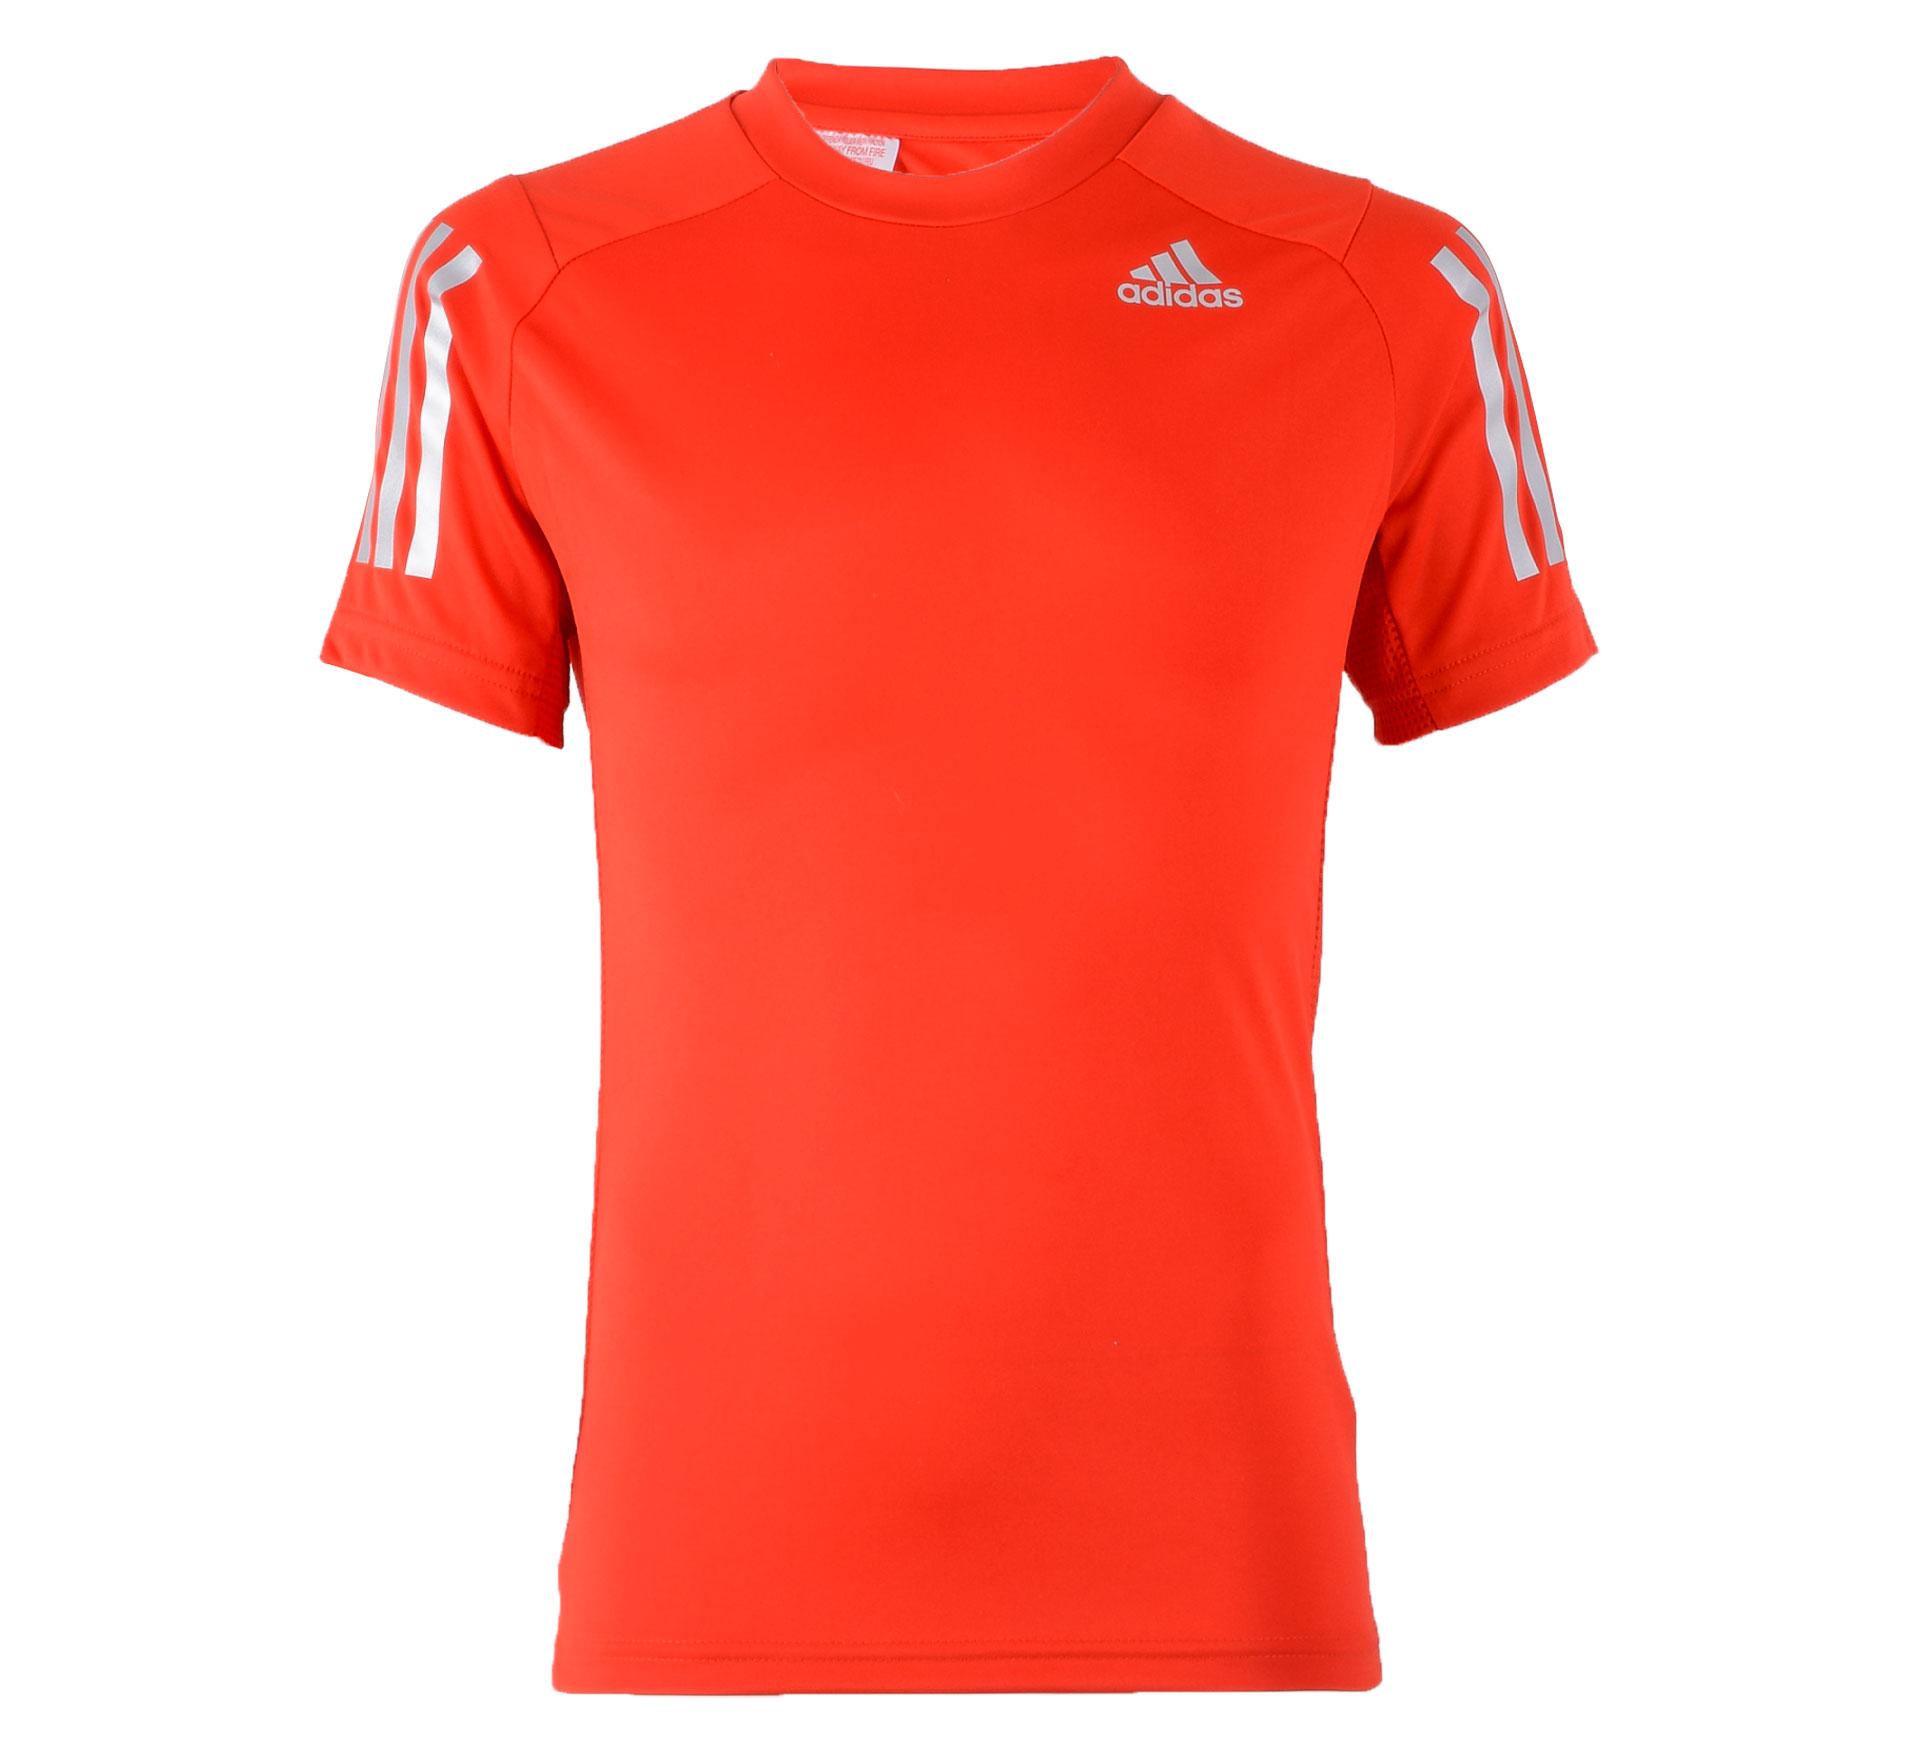 Adidas YB Trainings Tee rood - zilver